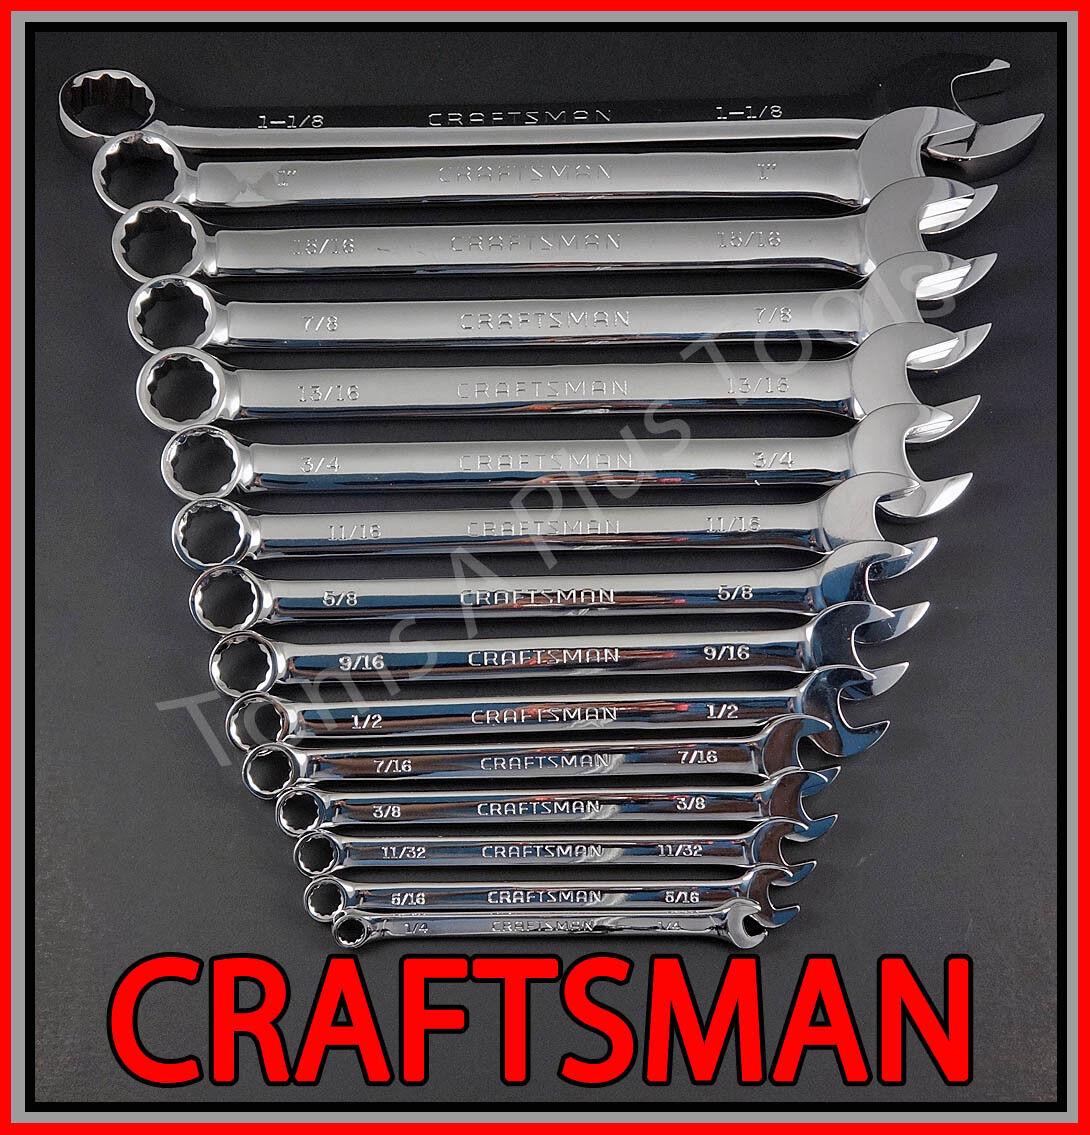 CRAFTSMAN HAND TOOLS 15pc FULL POLISH Long Beam SAE Combination Wrench Set